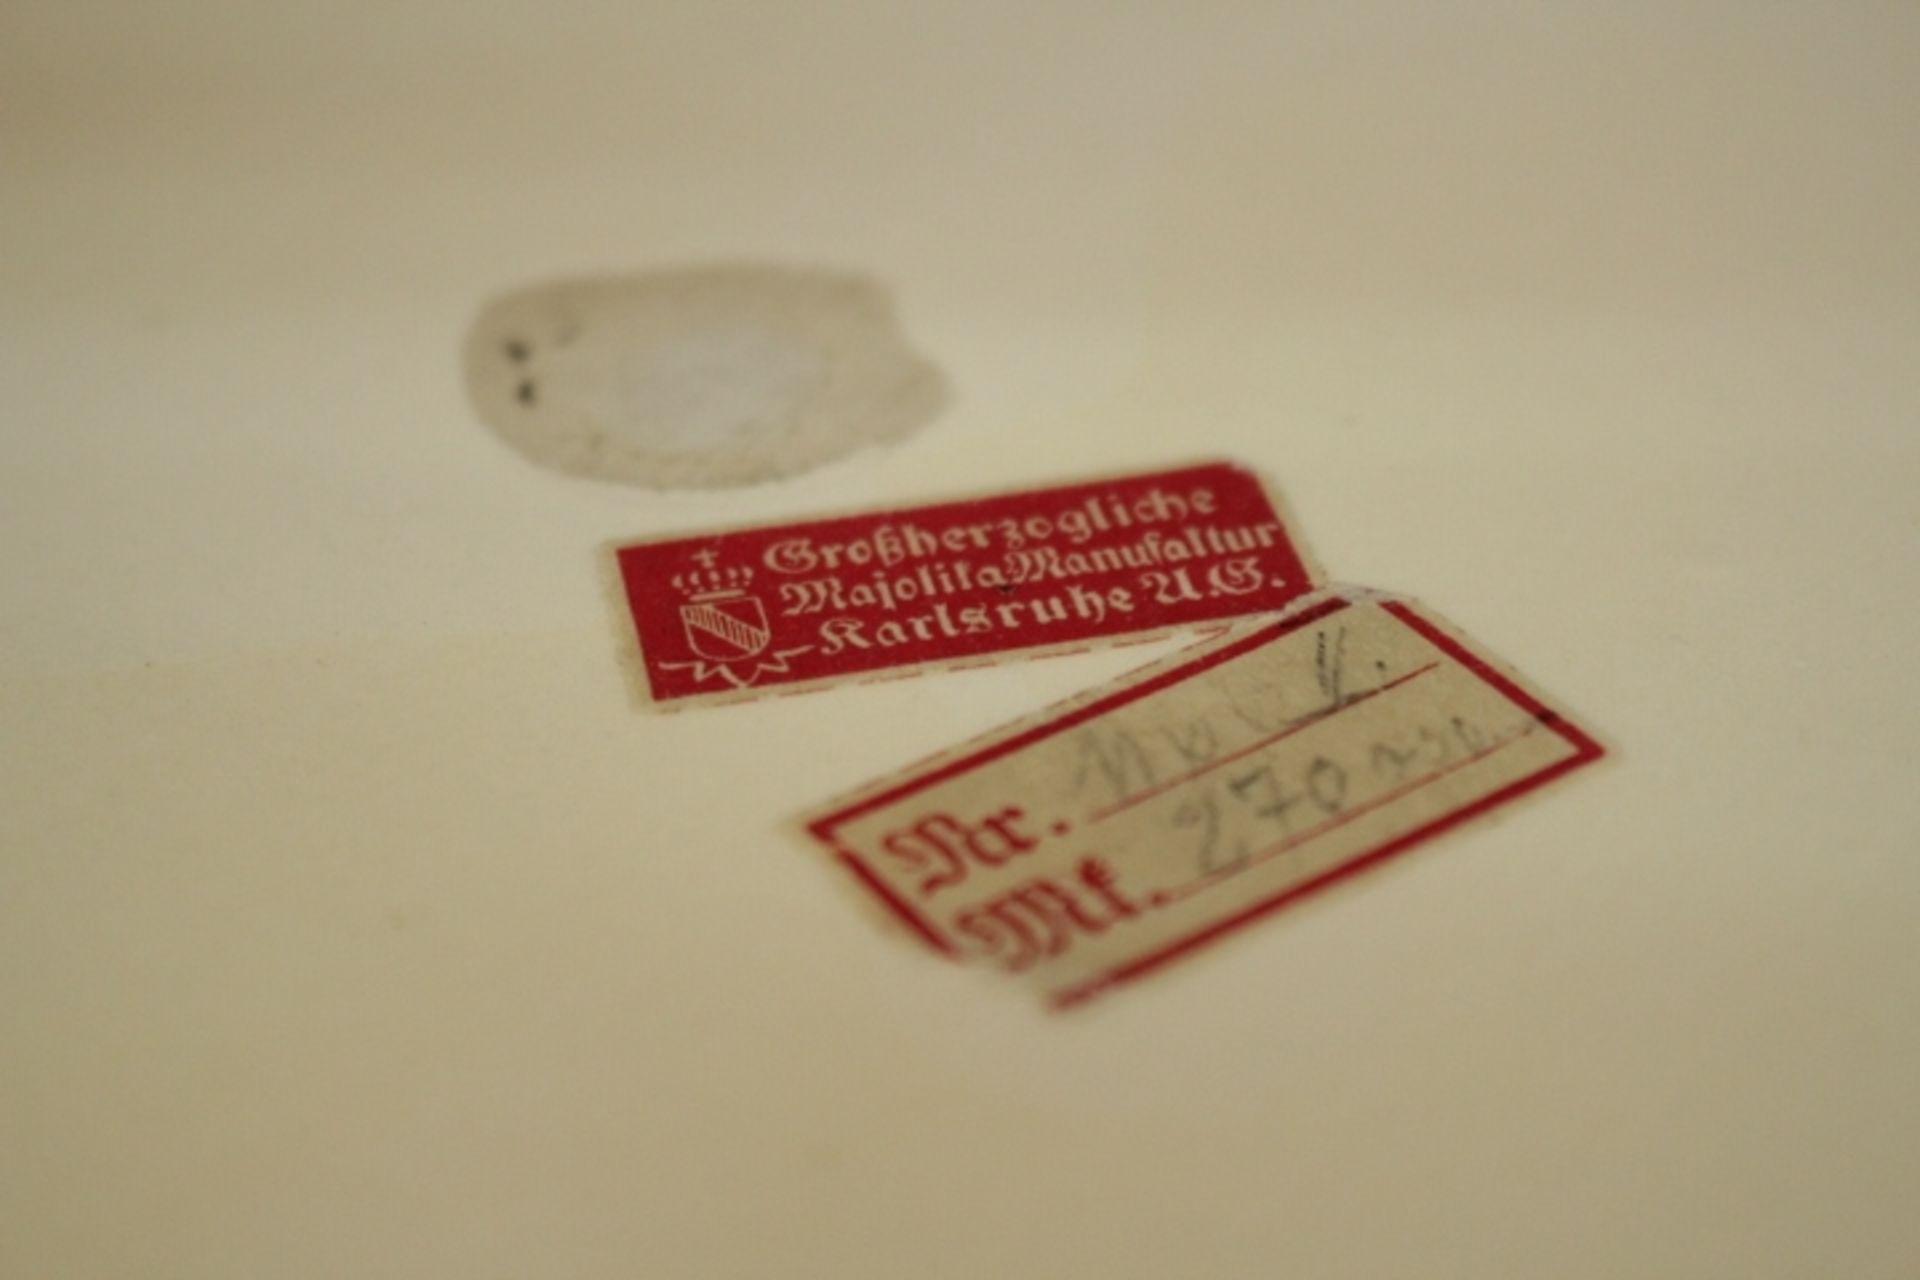 Karlsruher Majolika Schale Kinderreigen Entwurf:Wilhelm Süs 1910 -1930 Keramik Prägenr.1166 - Ec11 - Bild 2 aus 3